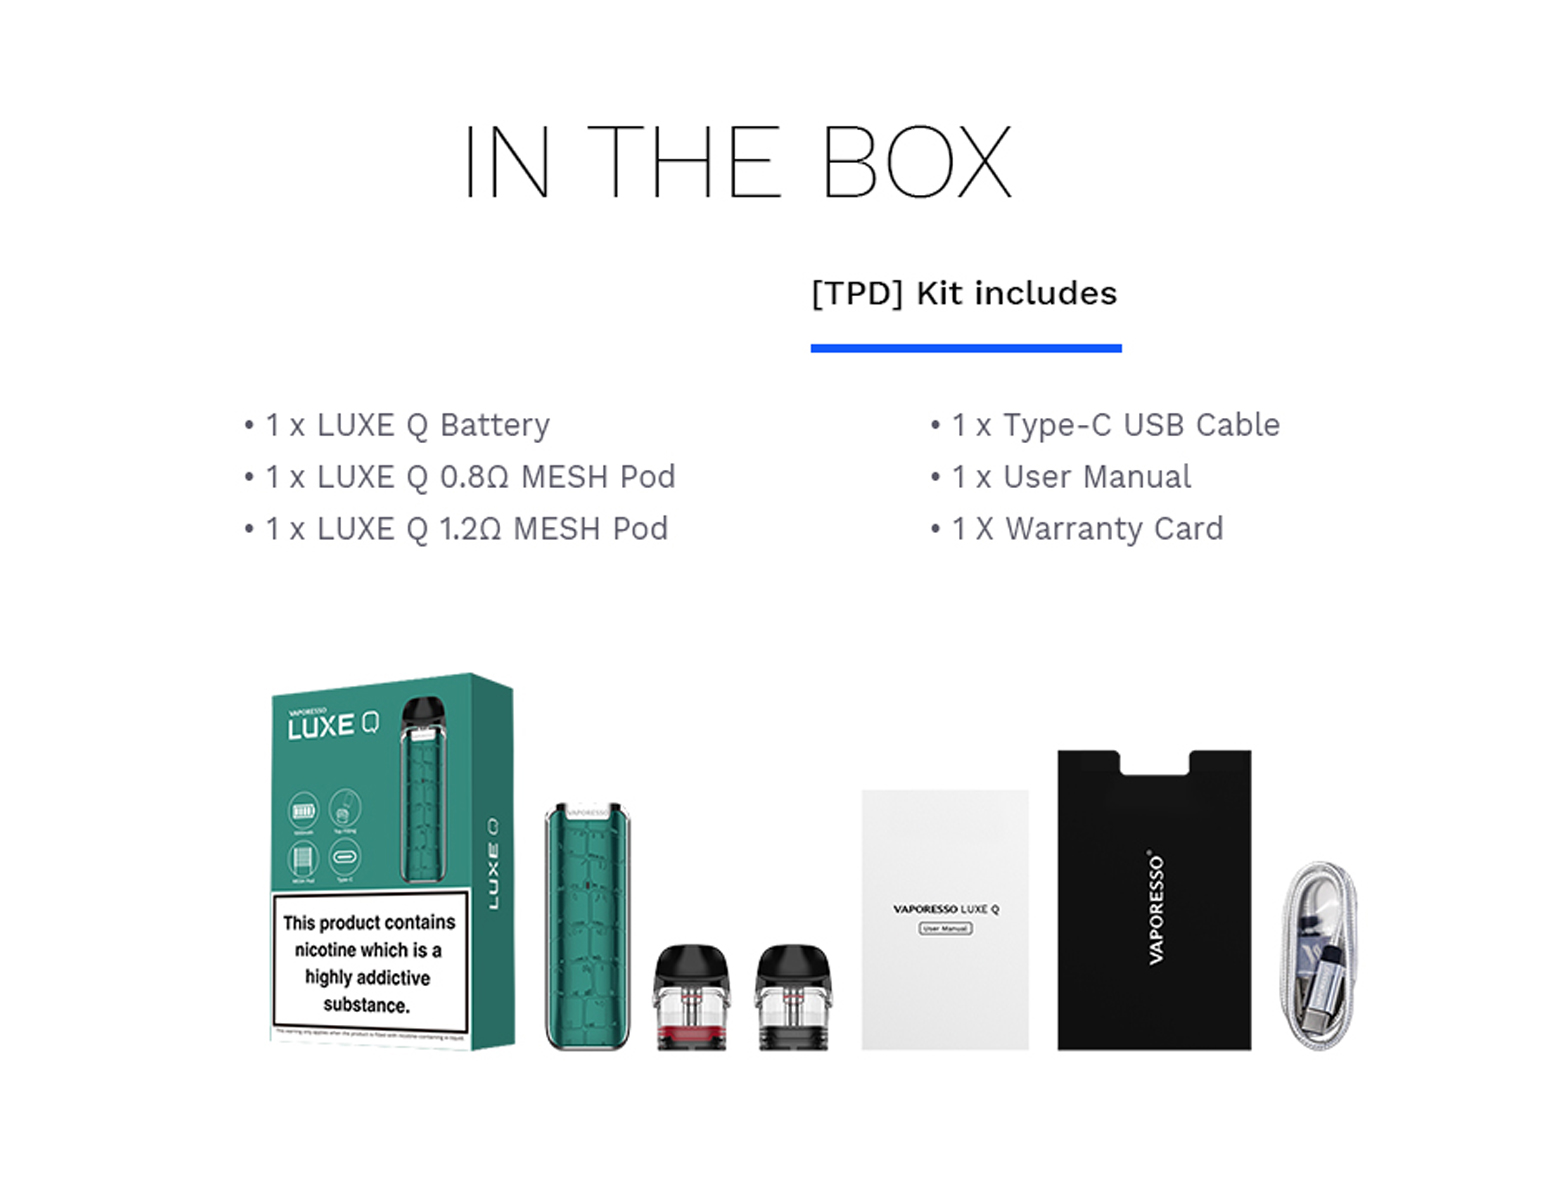 Vaporesso Luxe Q pin the box